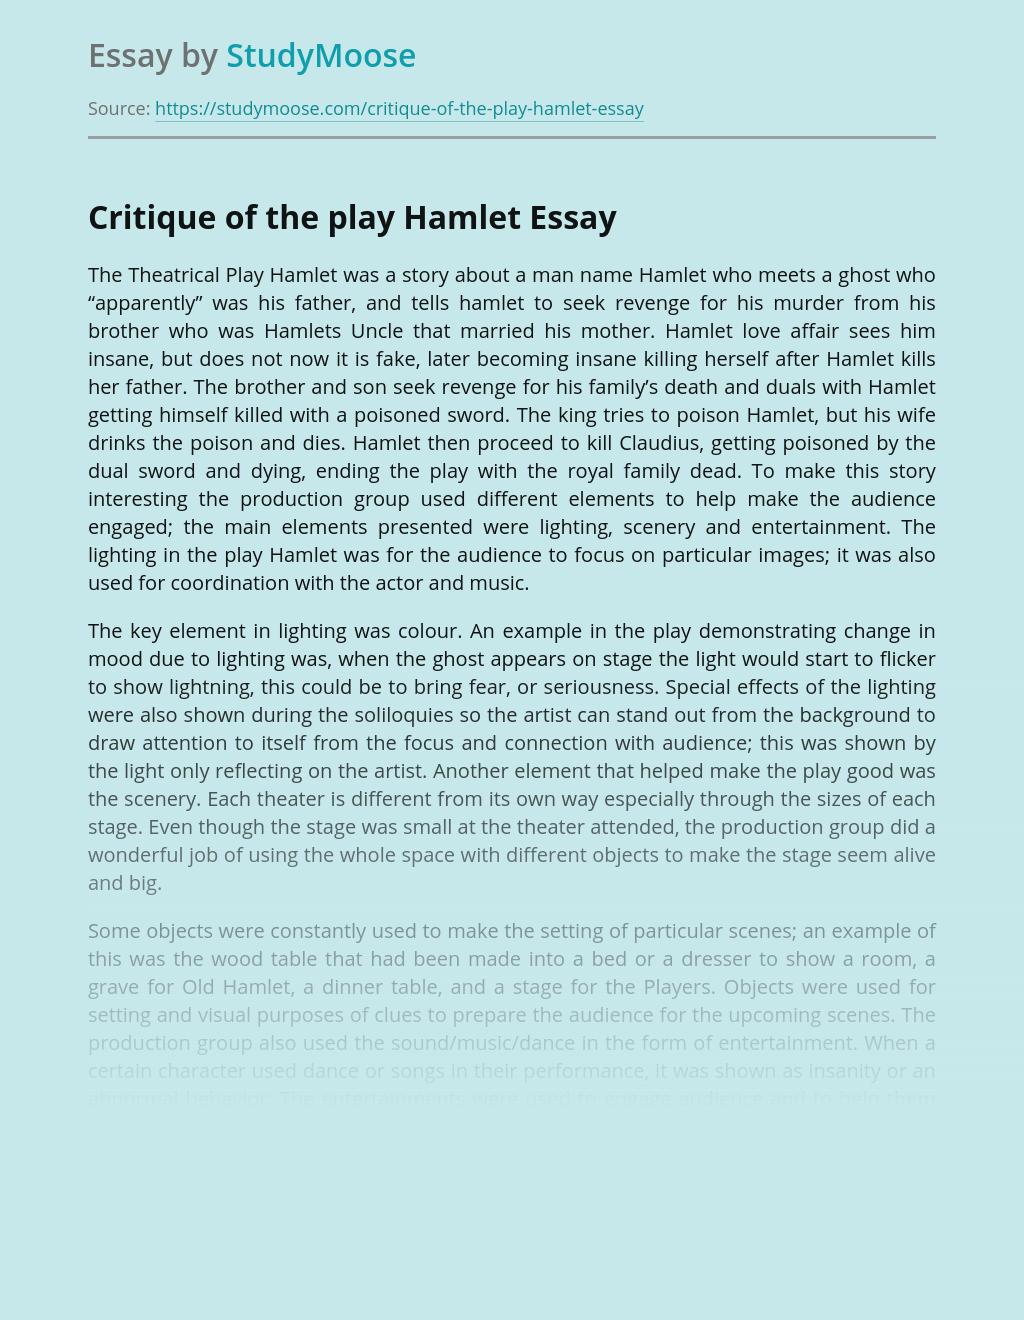 Critique of the play Hamlet